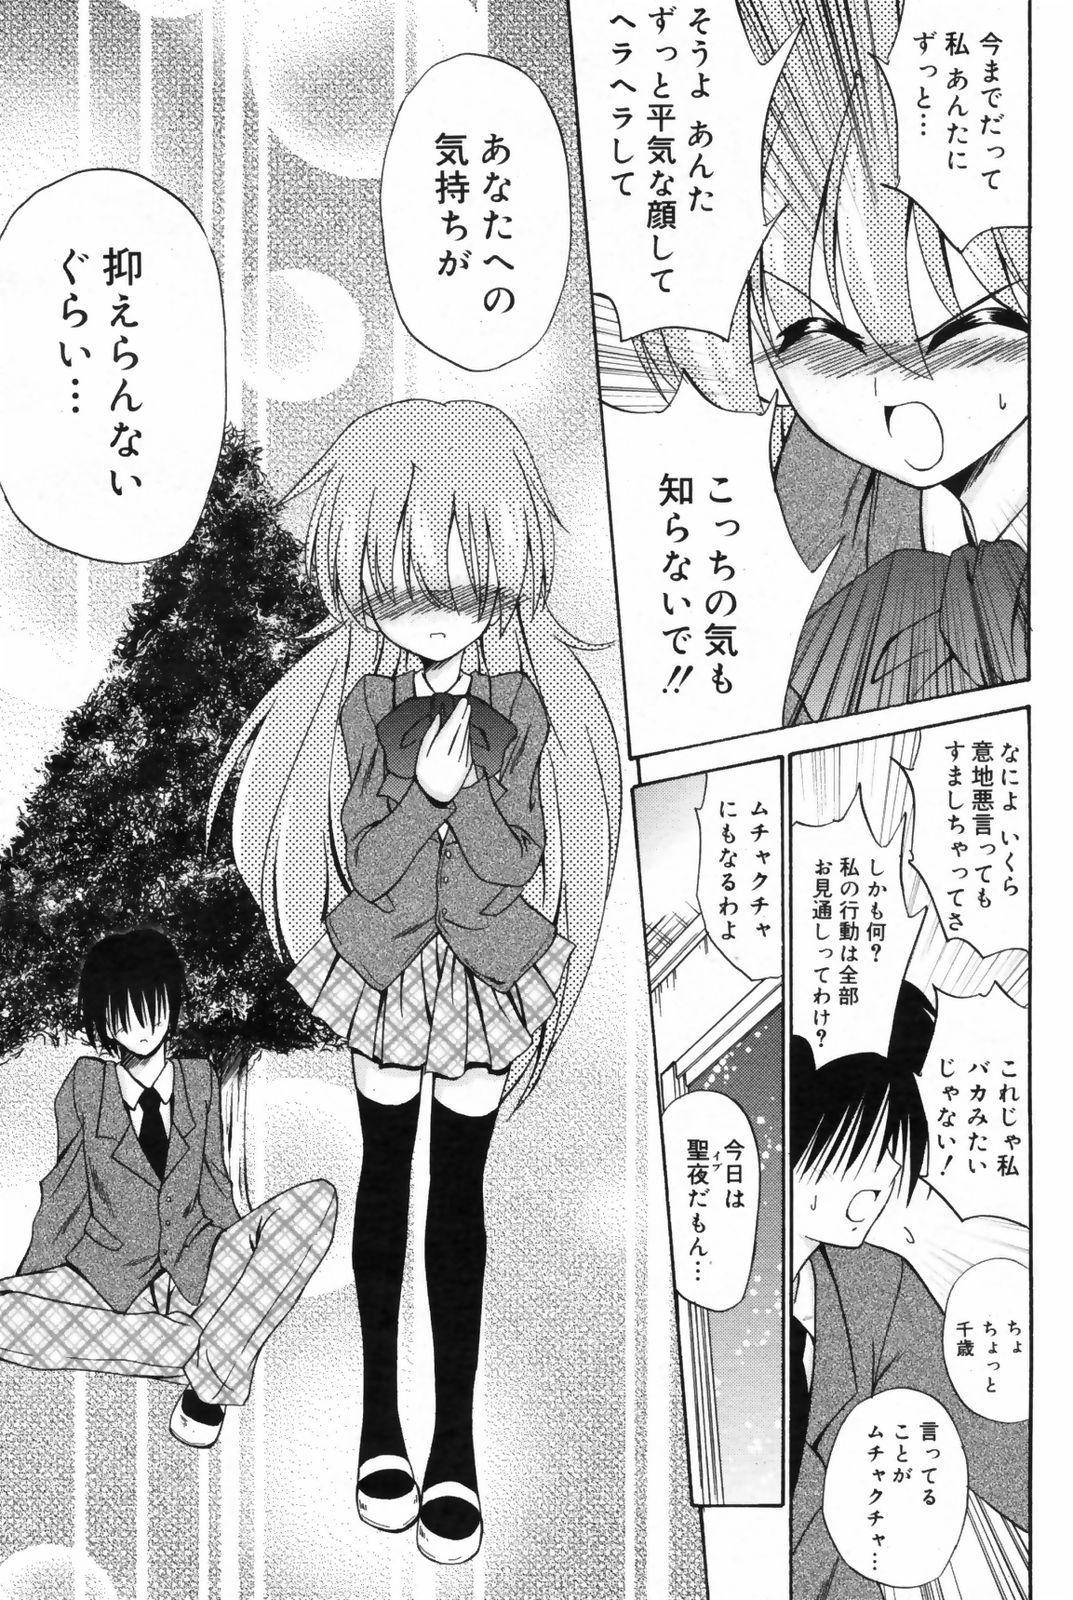 Manga Bangaichi 2009-02 Vol. 234 166